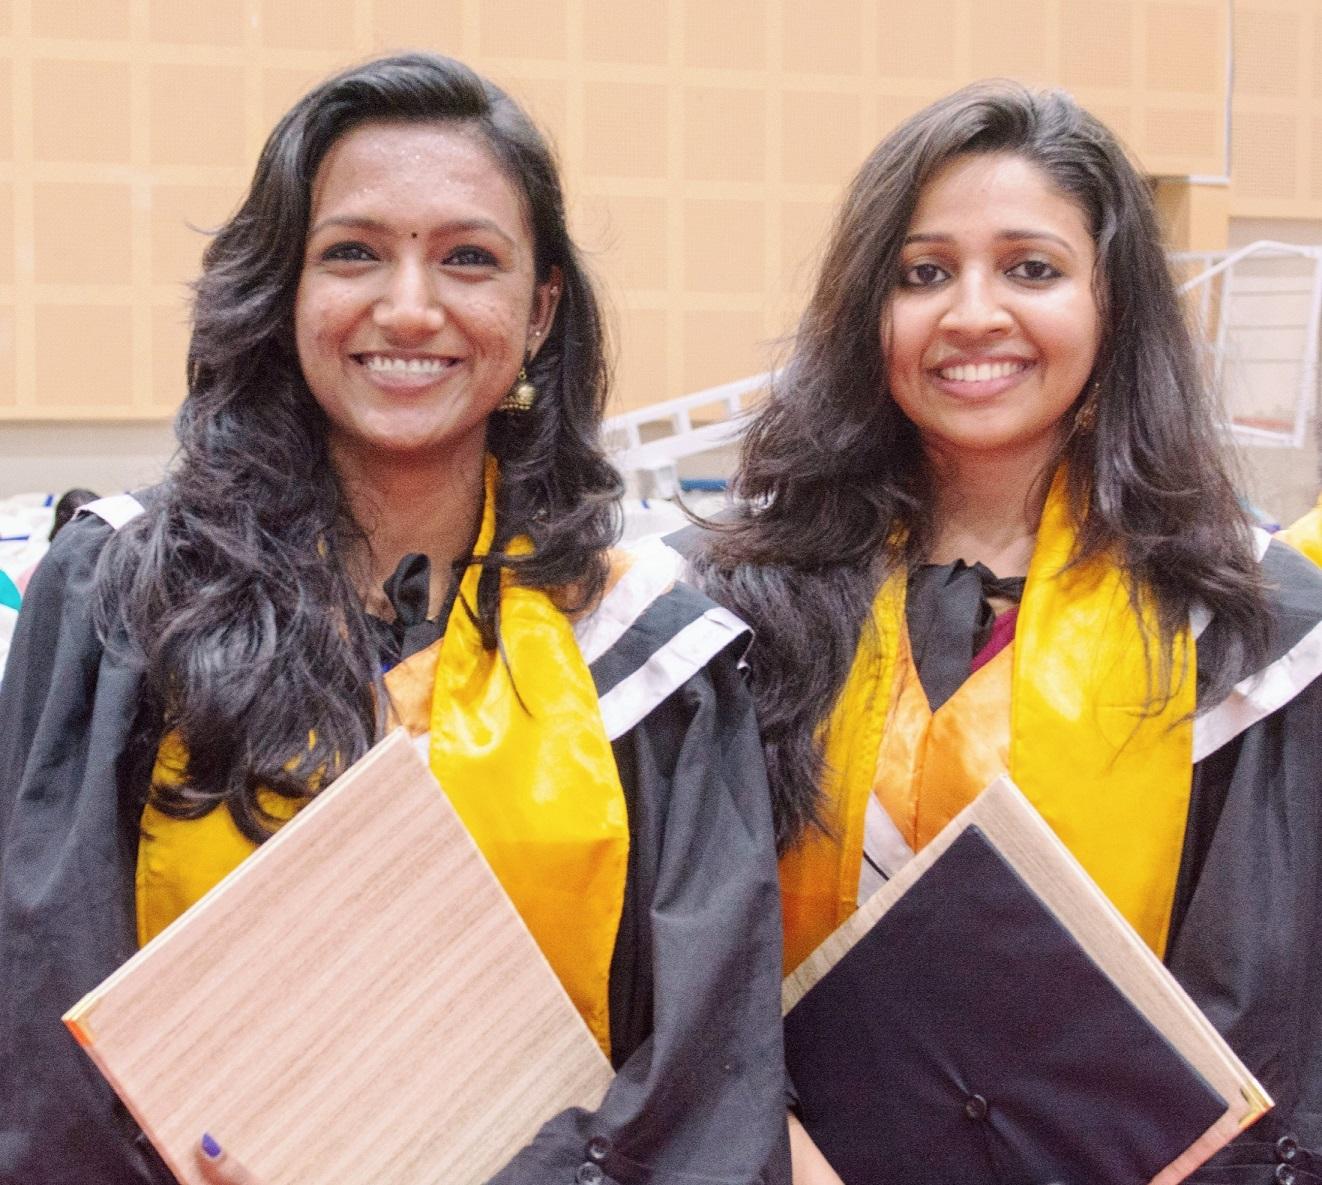 Keerthi and Devika on their Graduation Day 2019.